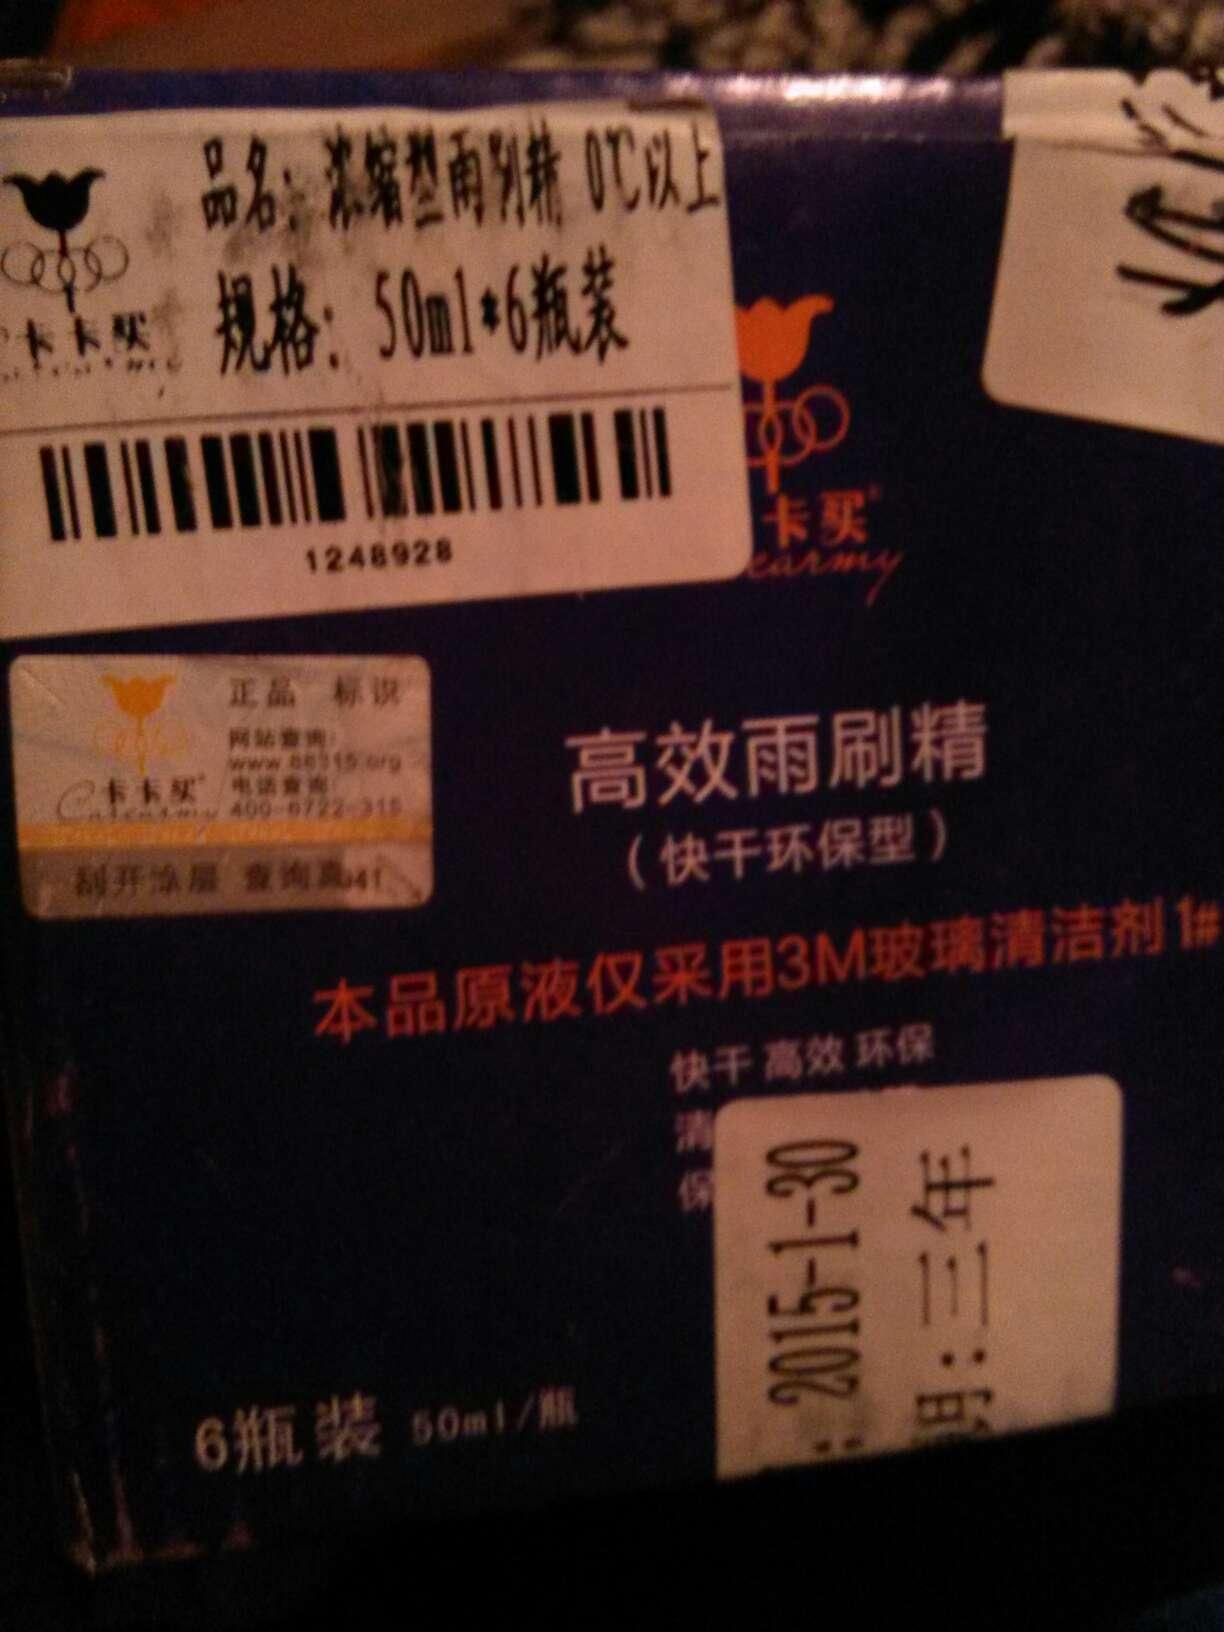 online shopping handbags cheap 00941219 discountonlinestore